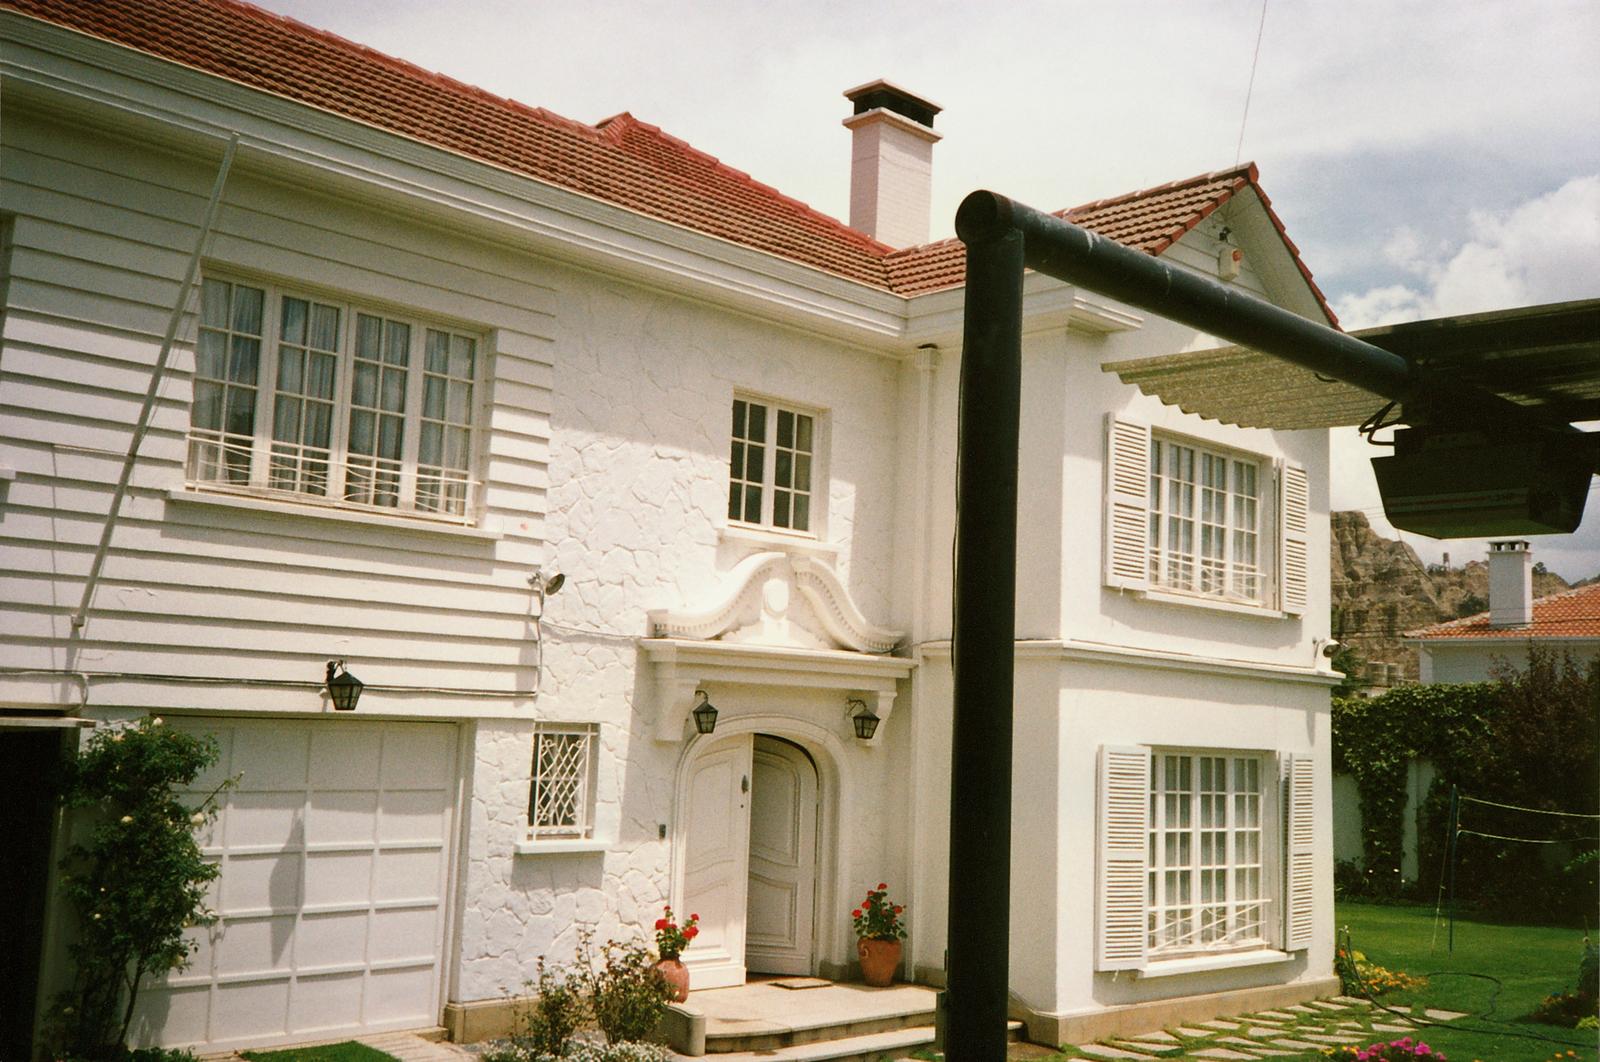 La Paz - Department of Defense Agency Head Residence - 1992